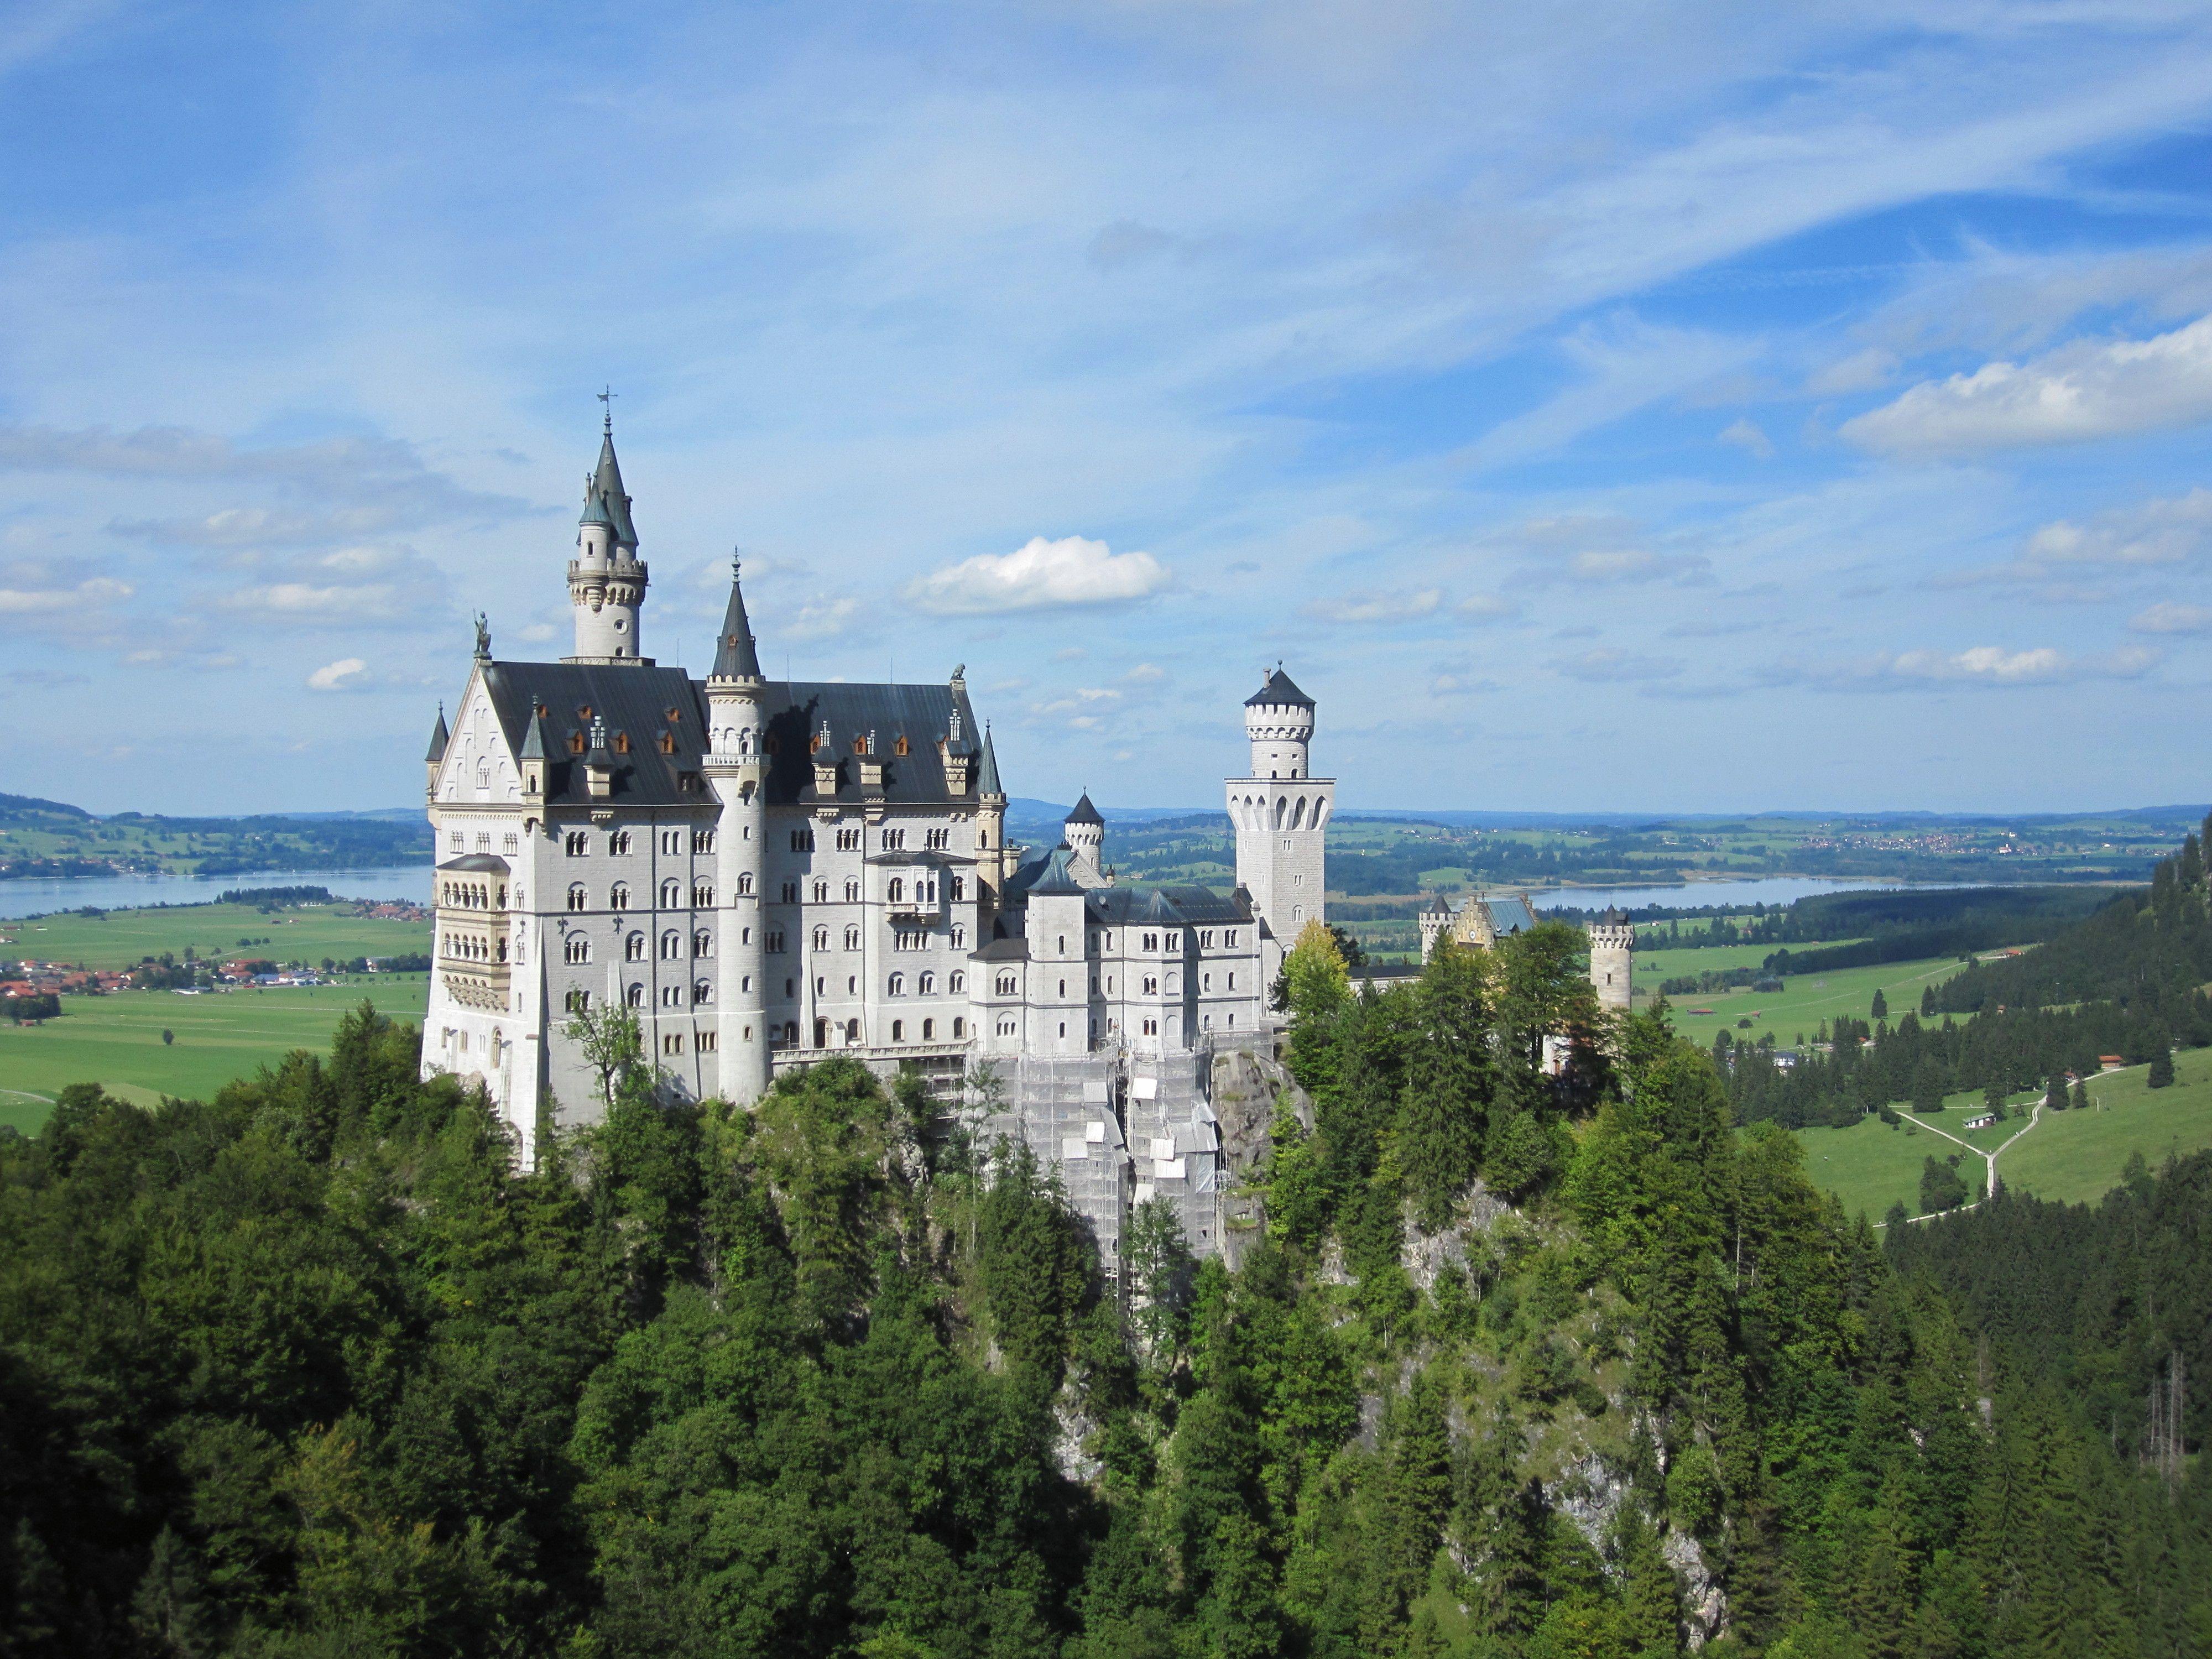 Cinderella S Castle Bing Images Neuschwanstein Castle Germany Castles Travel